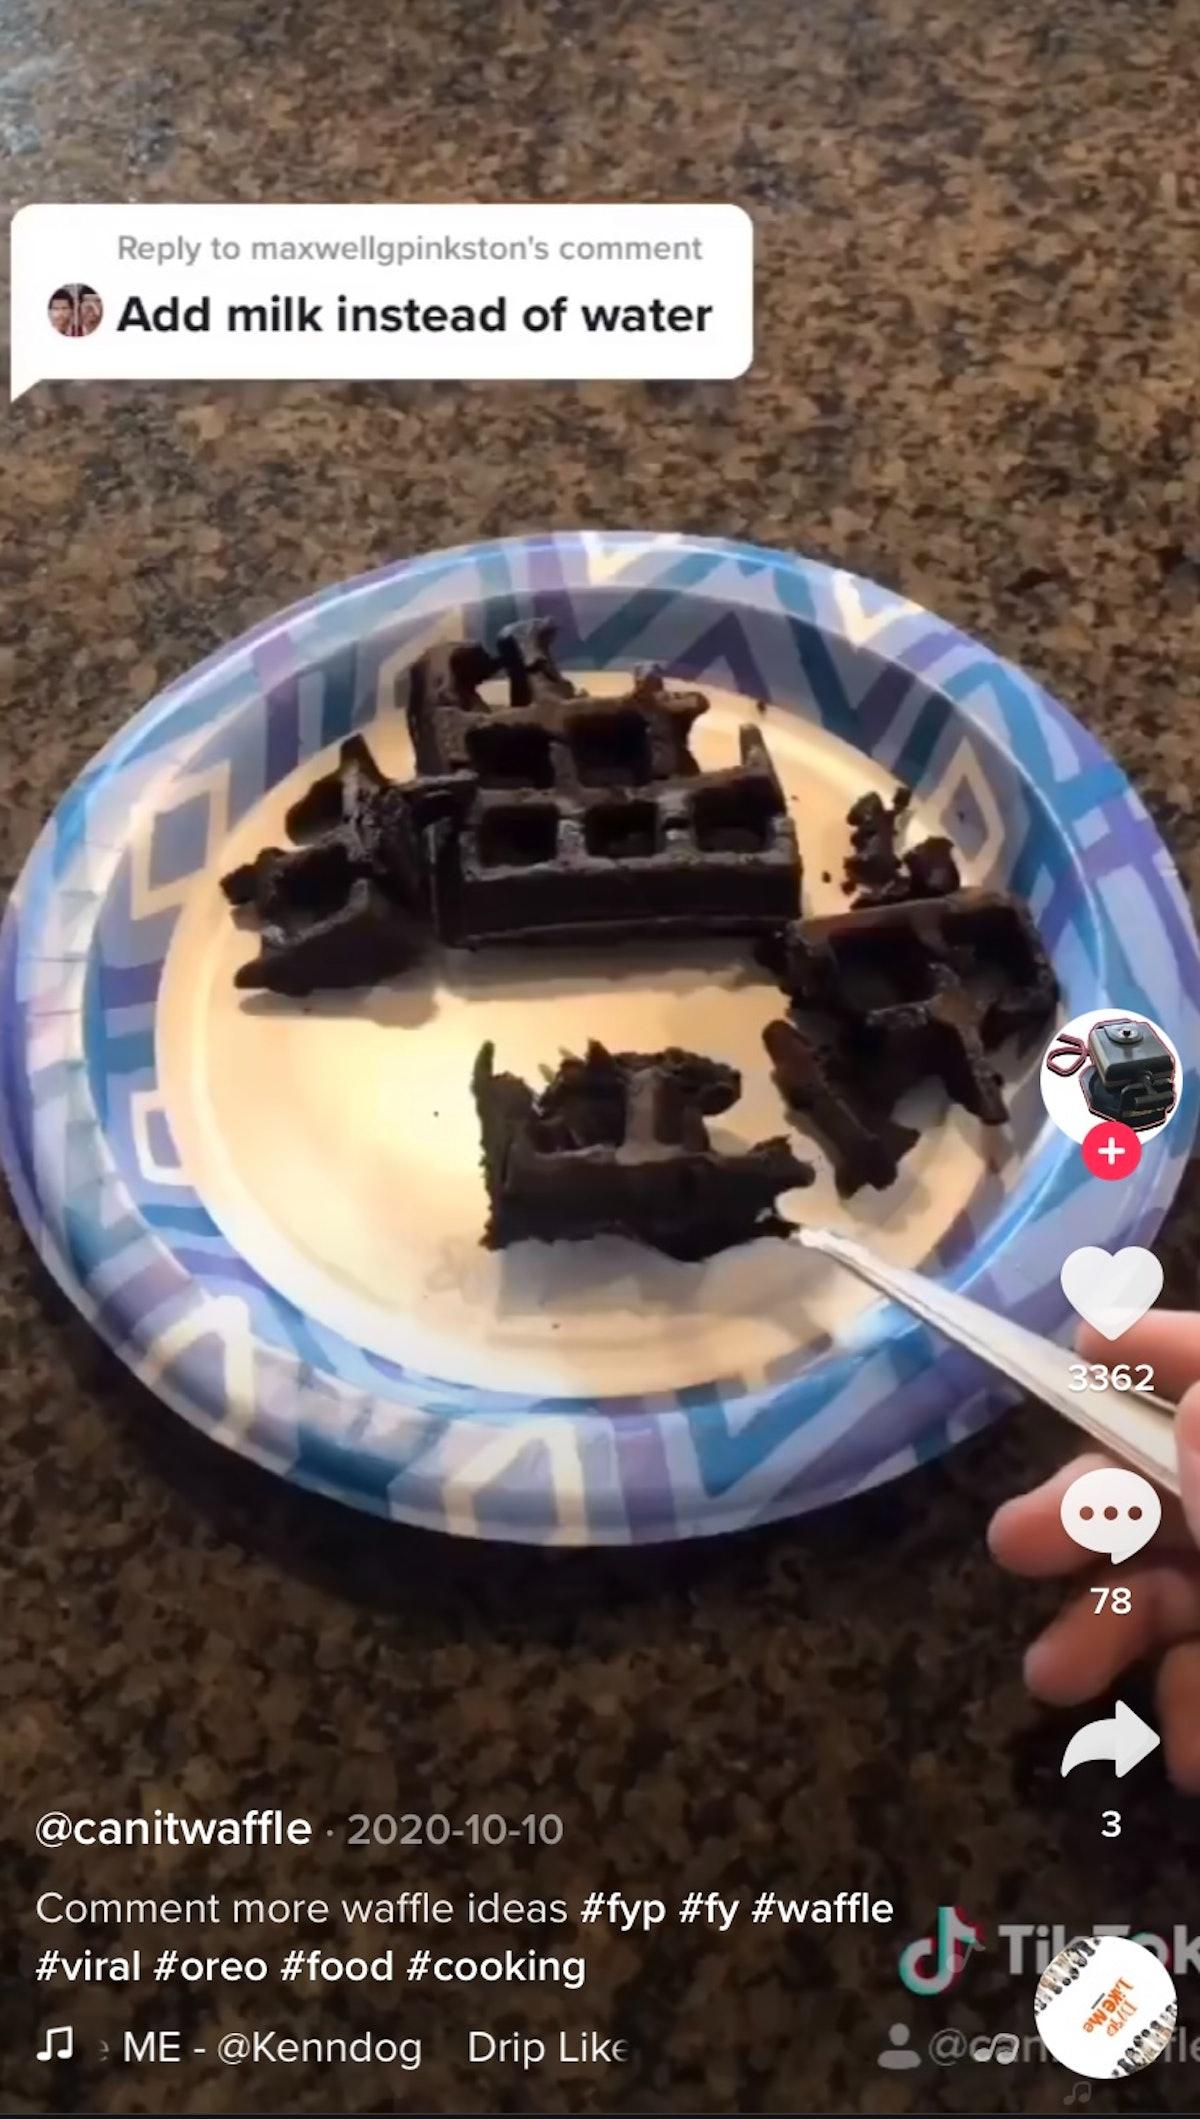 A man makes some chocolate Oreo waffles for TikTok.